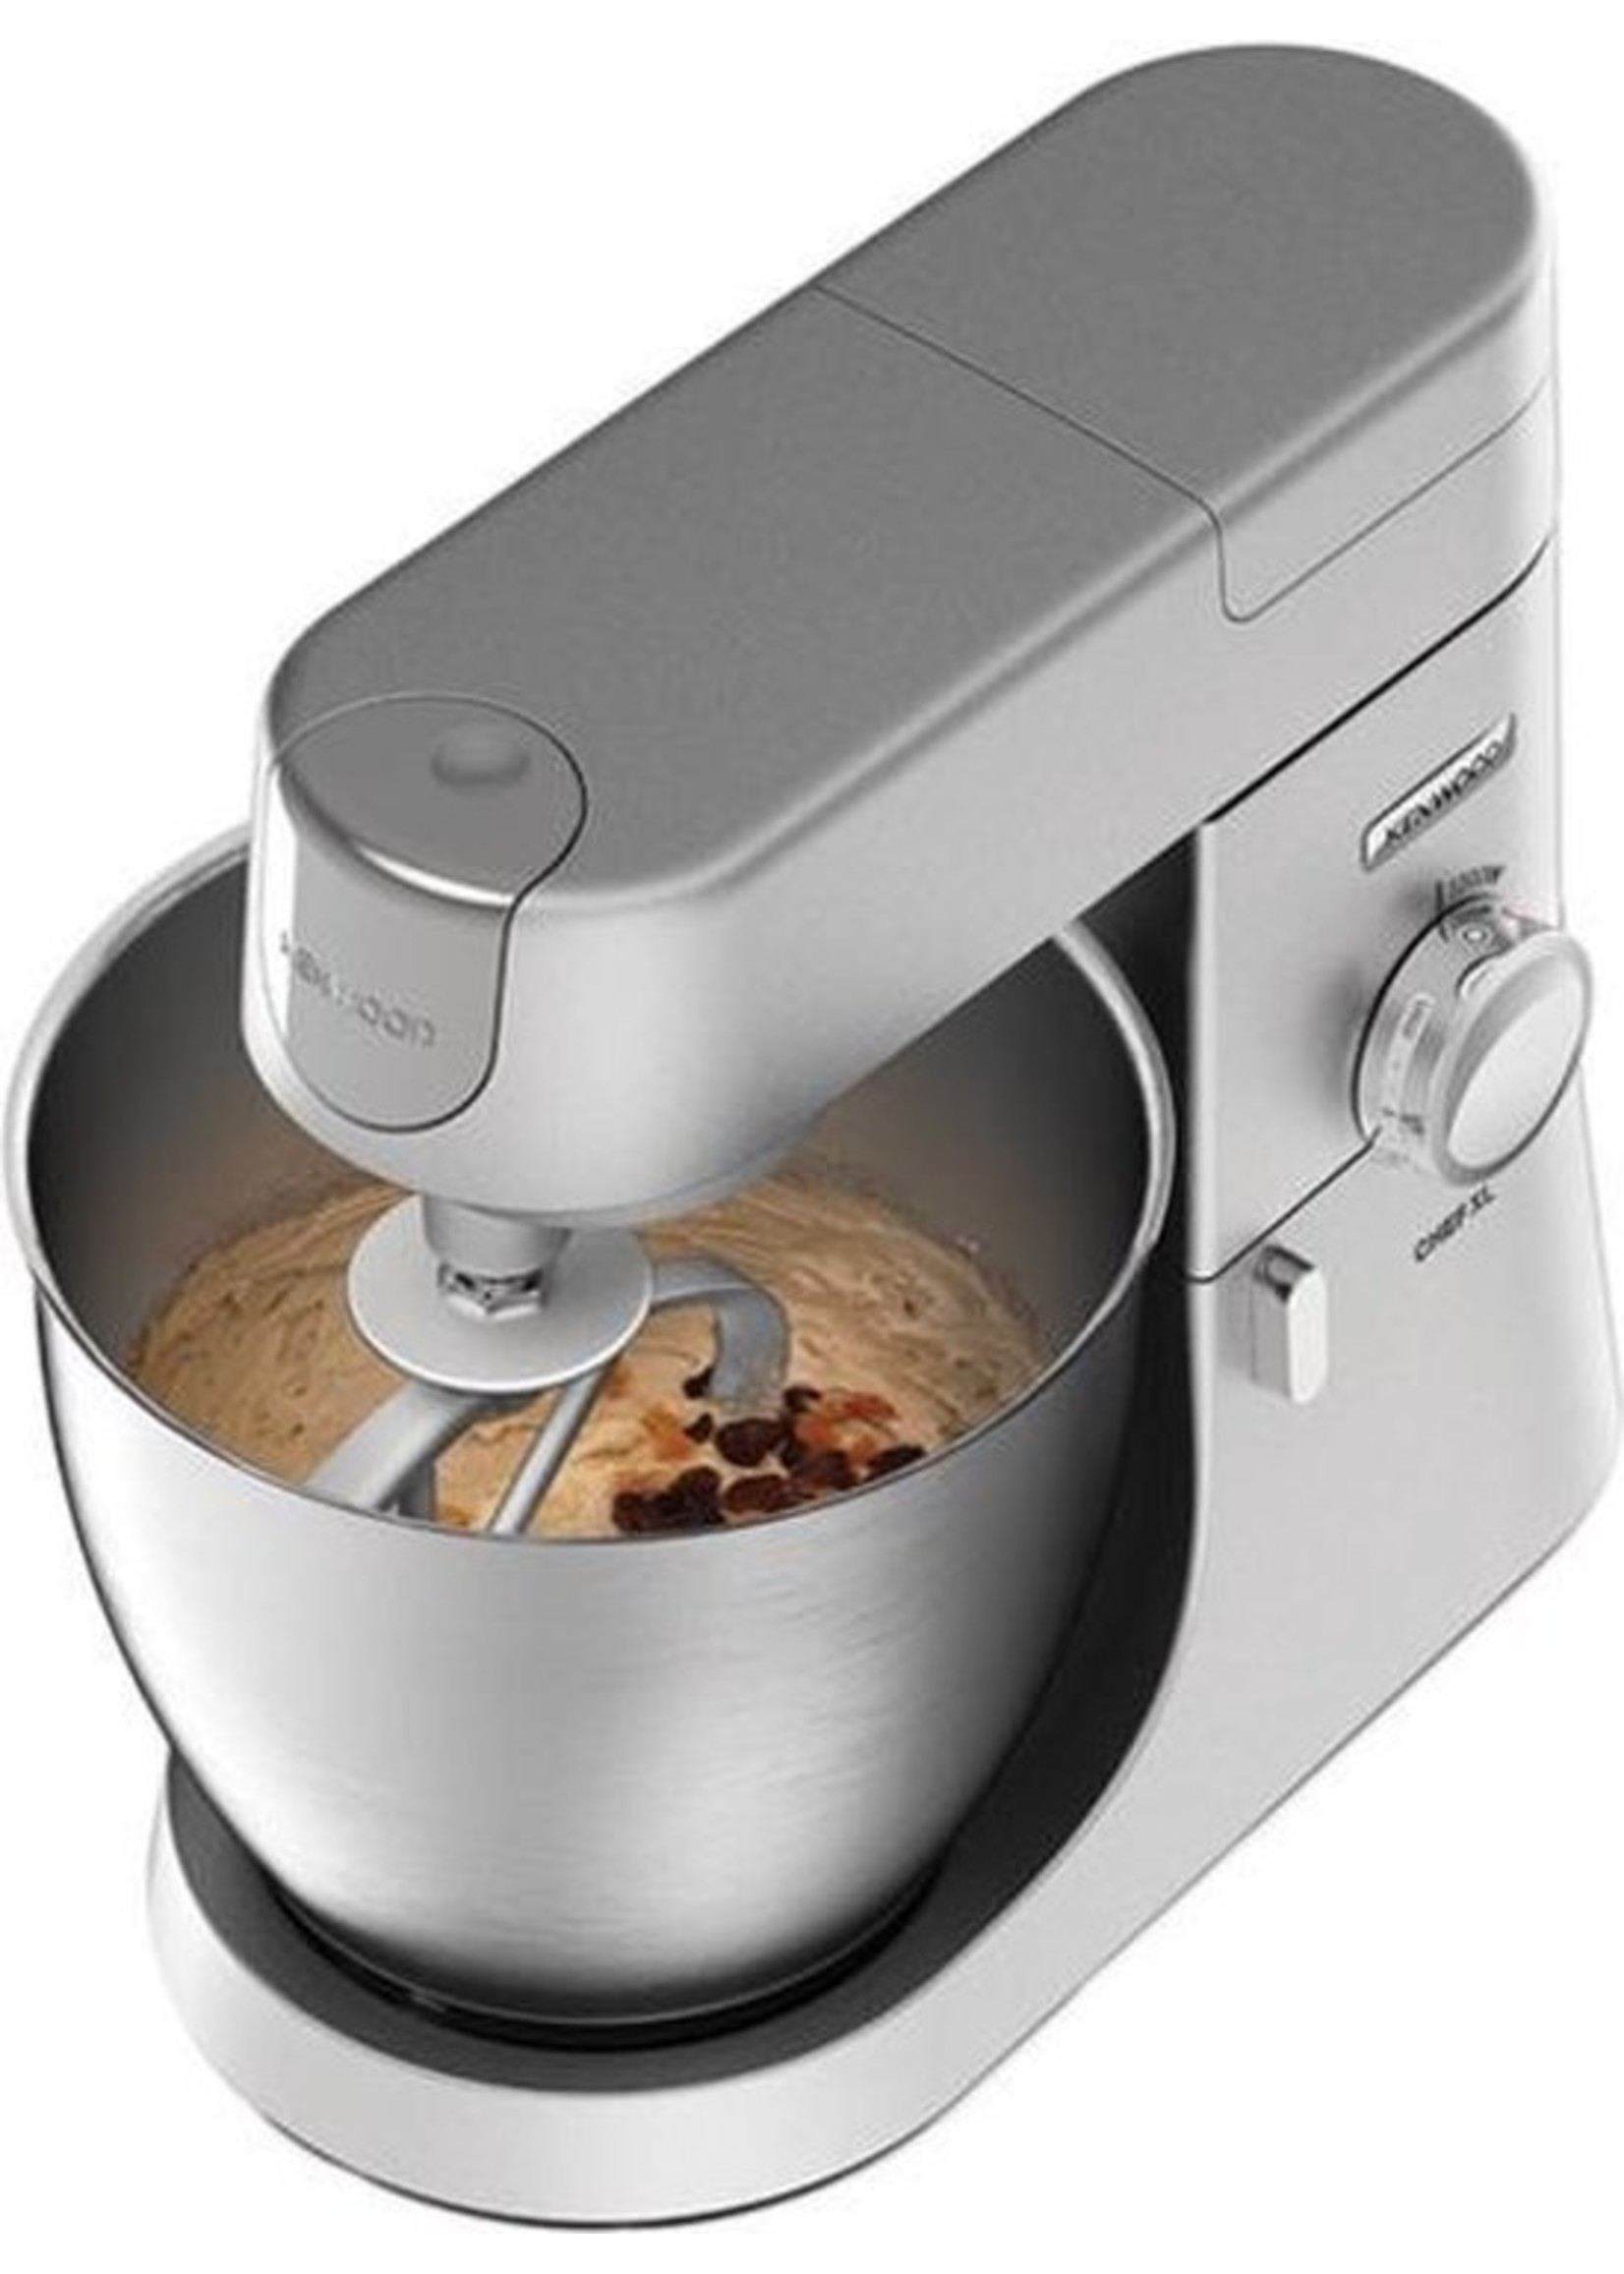 Kenwood Kenwood Chef XL KVL4100S - Keukenmachine - Zilver